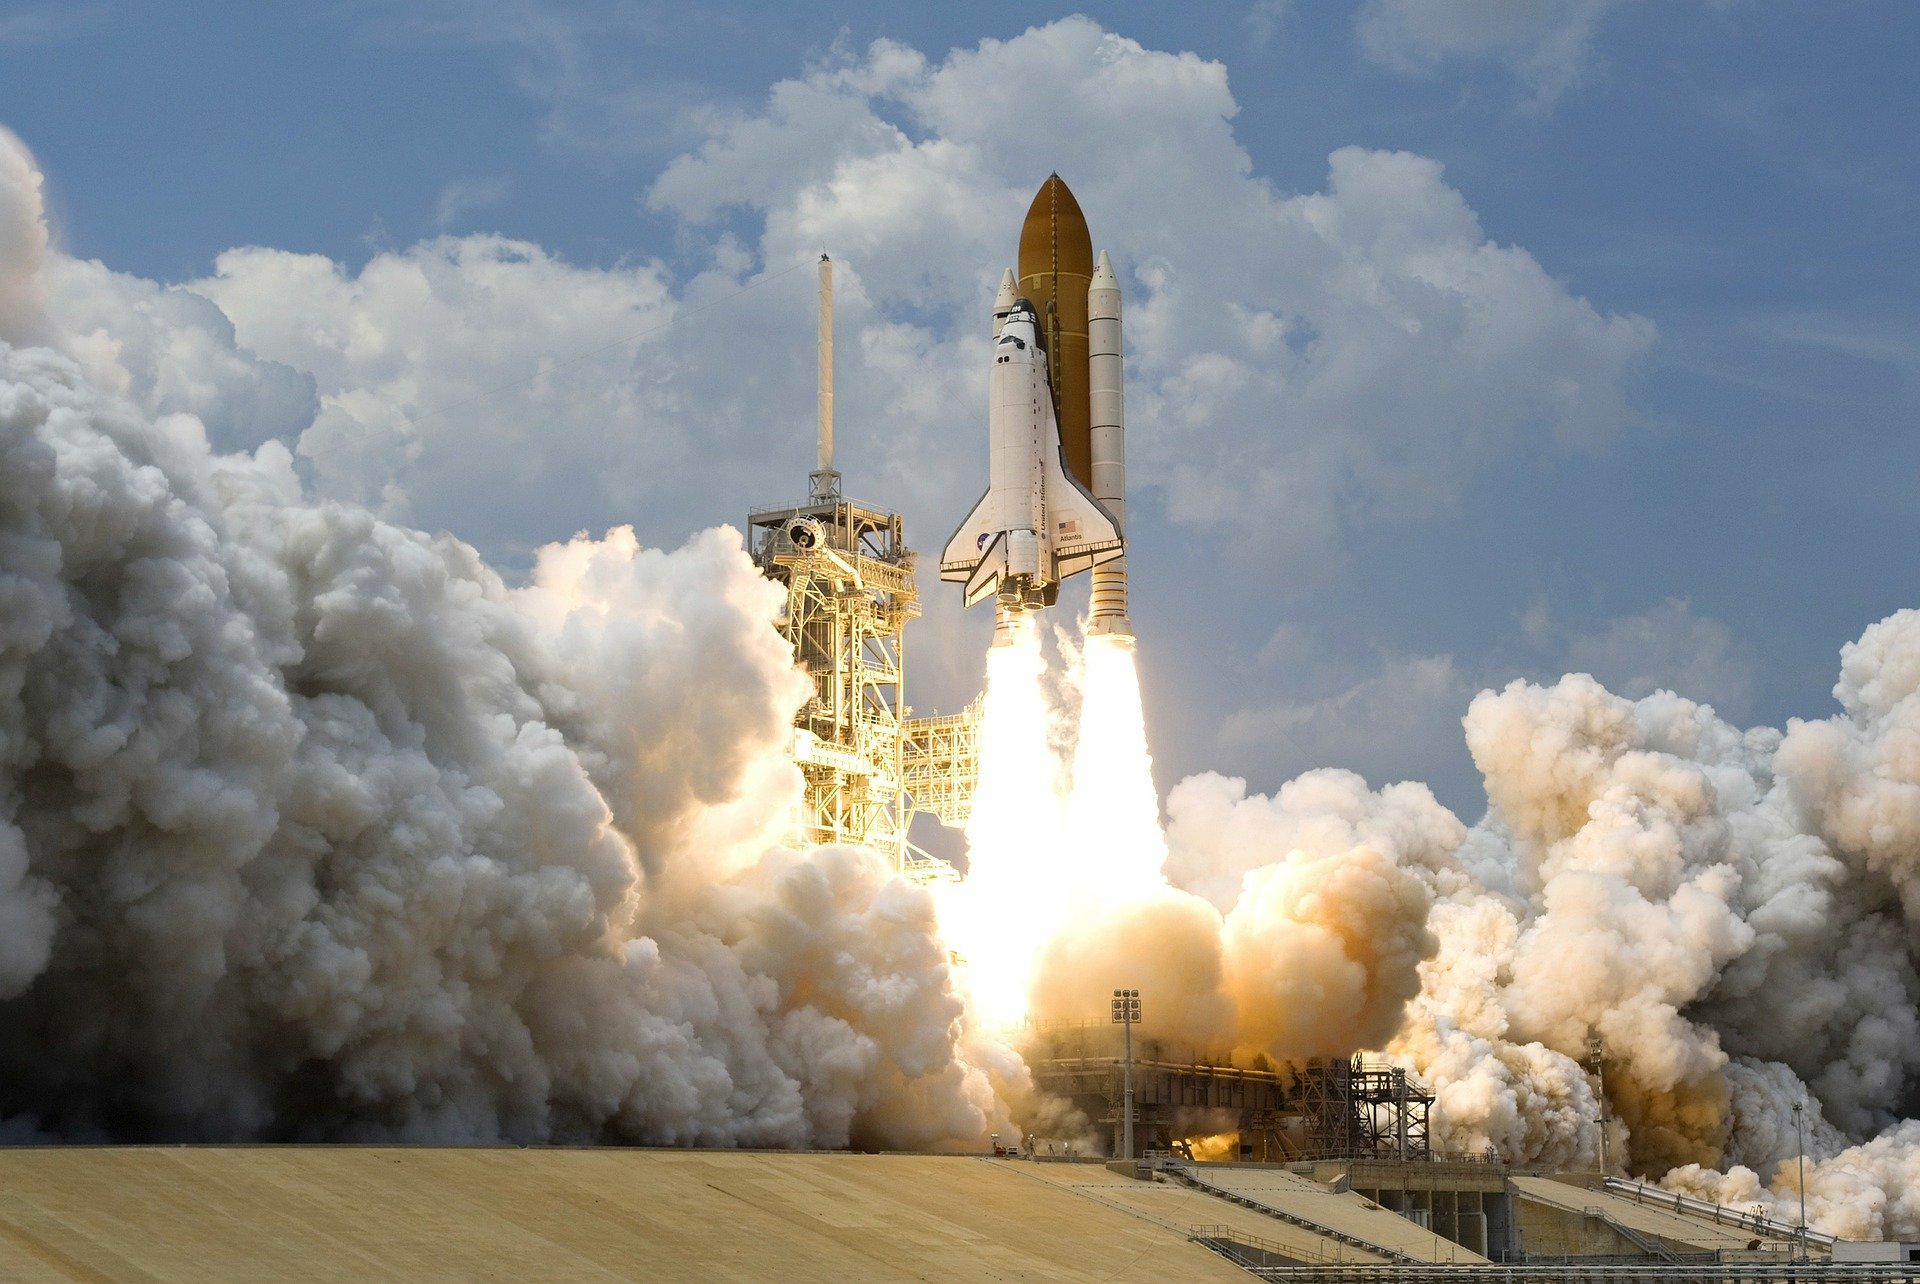 rocket-launch-67643_1920